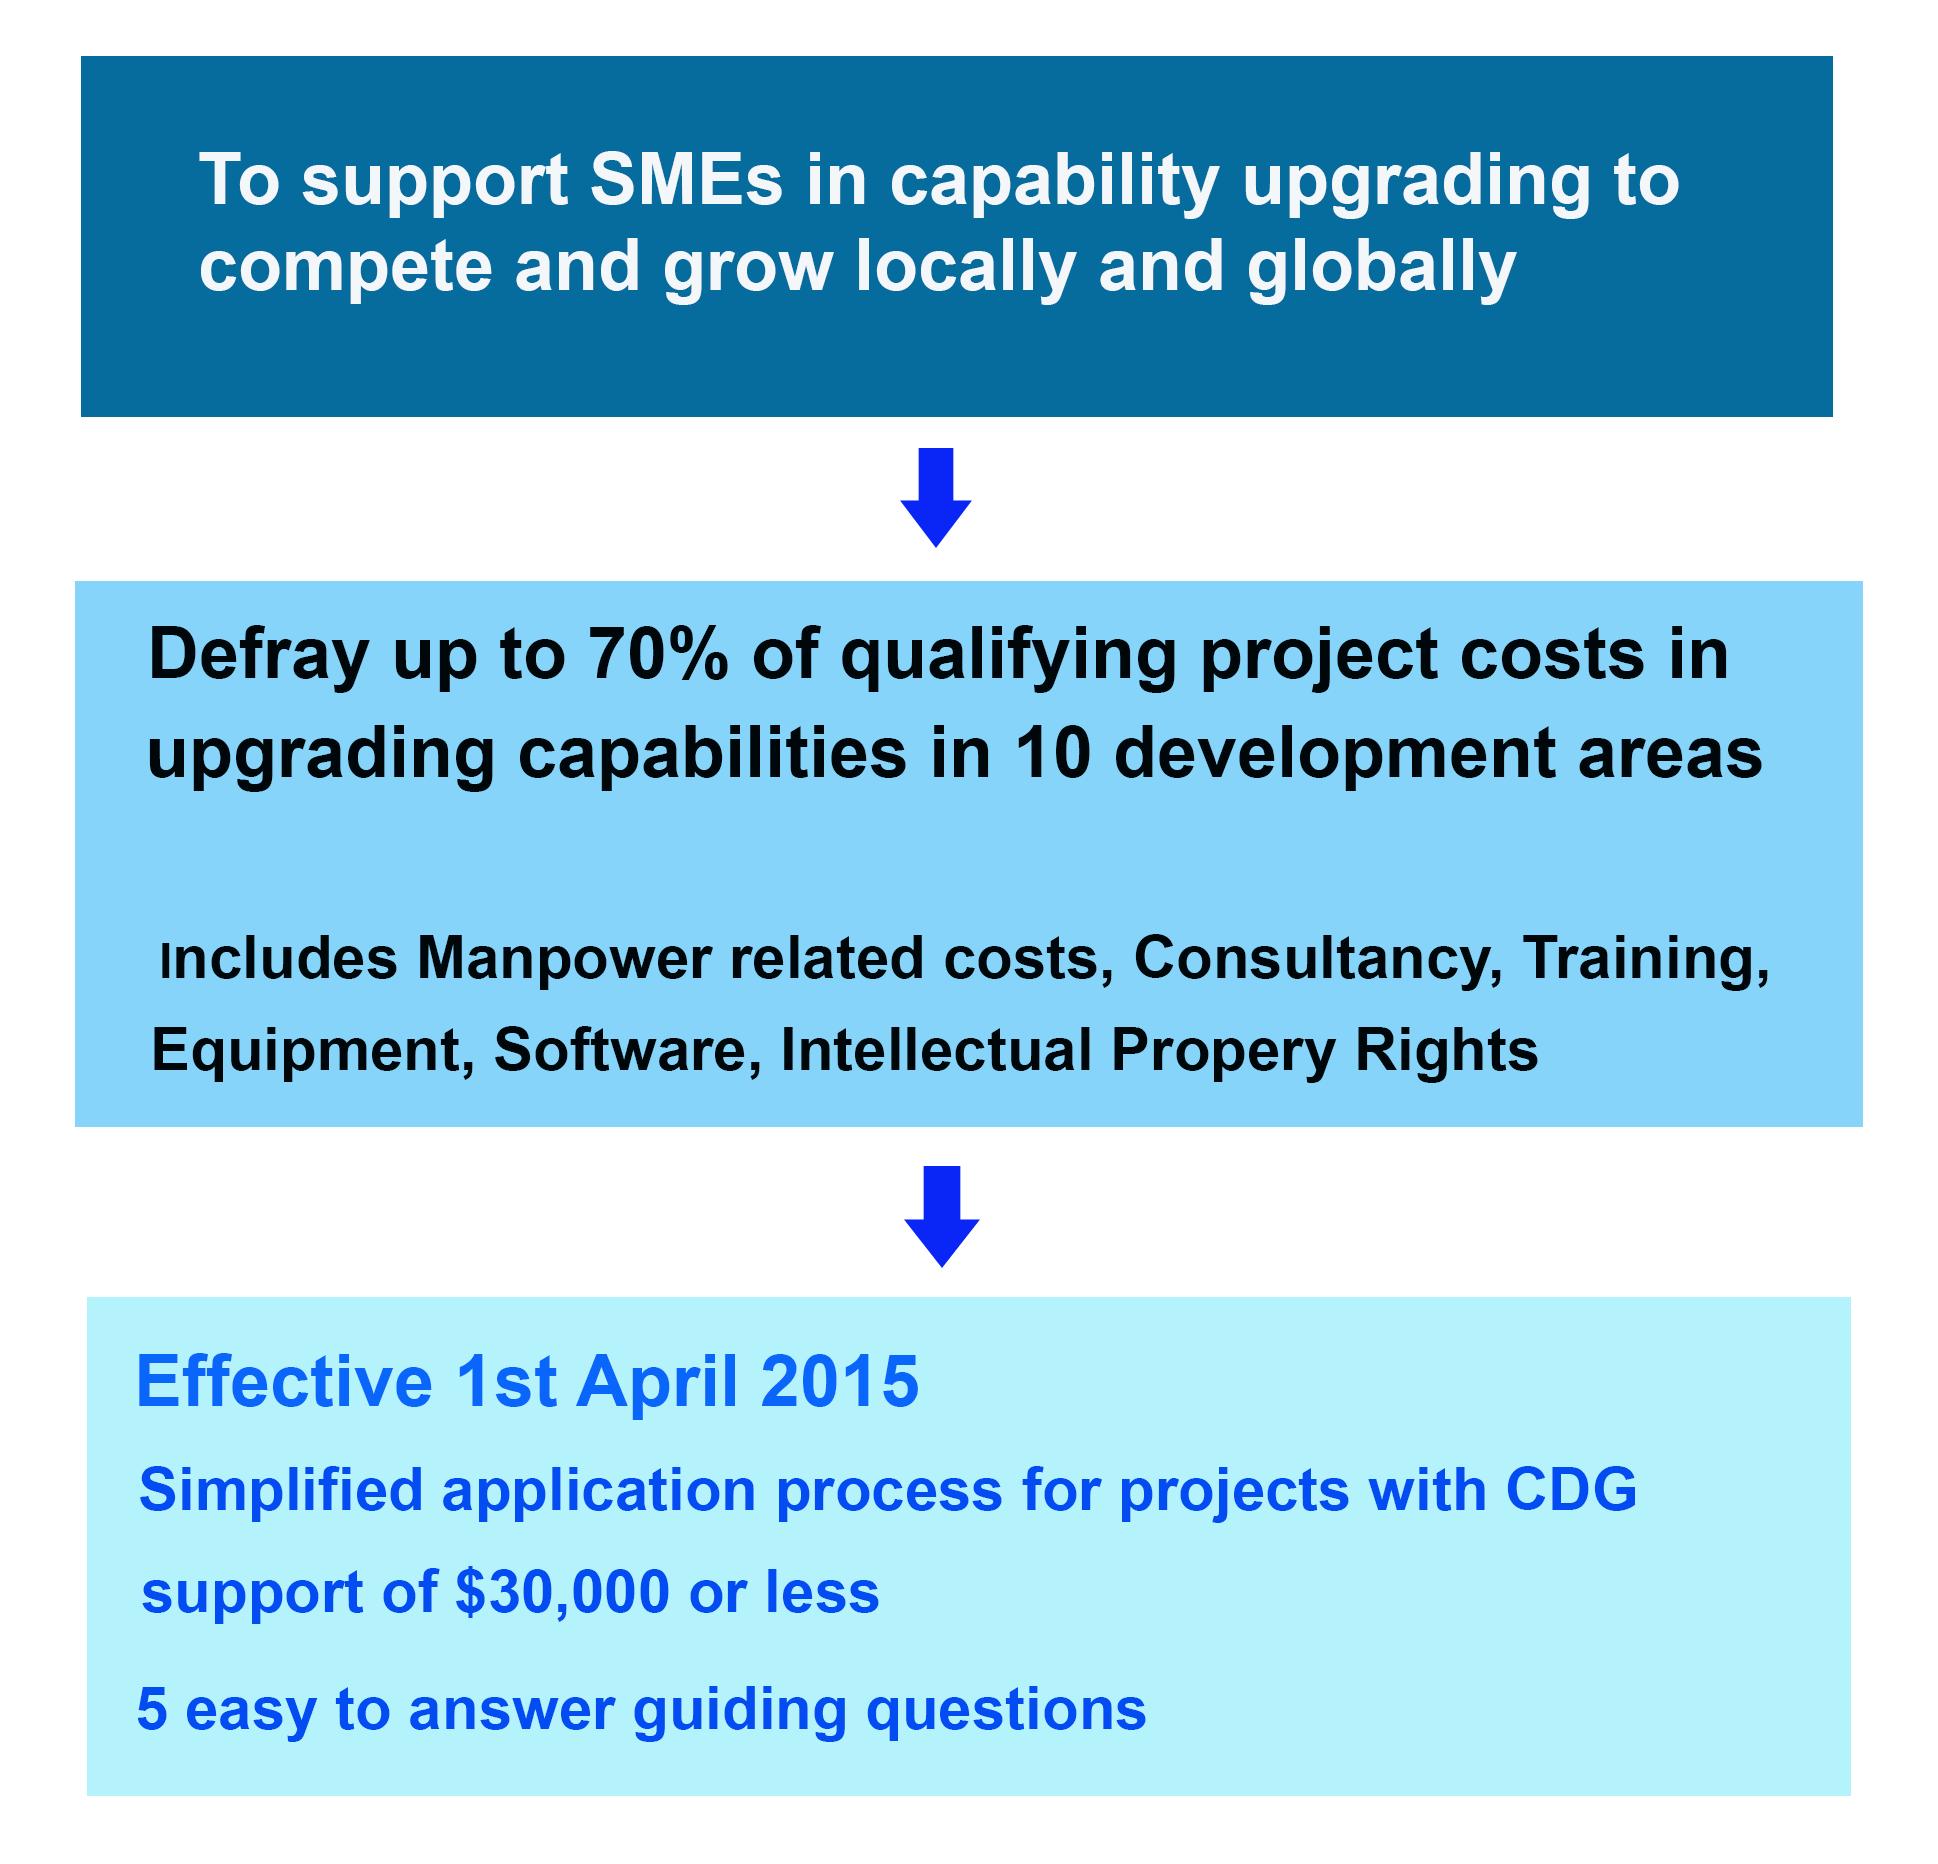 Capability Development Grant, SPRING